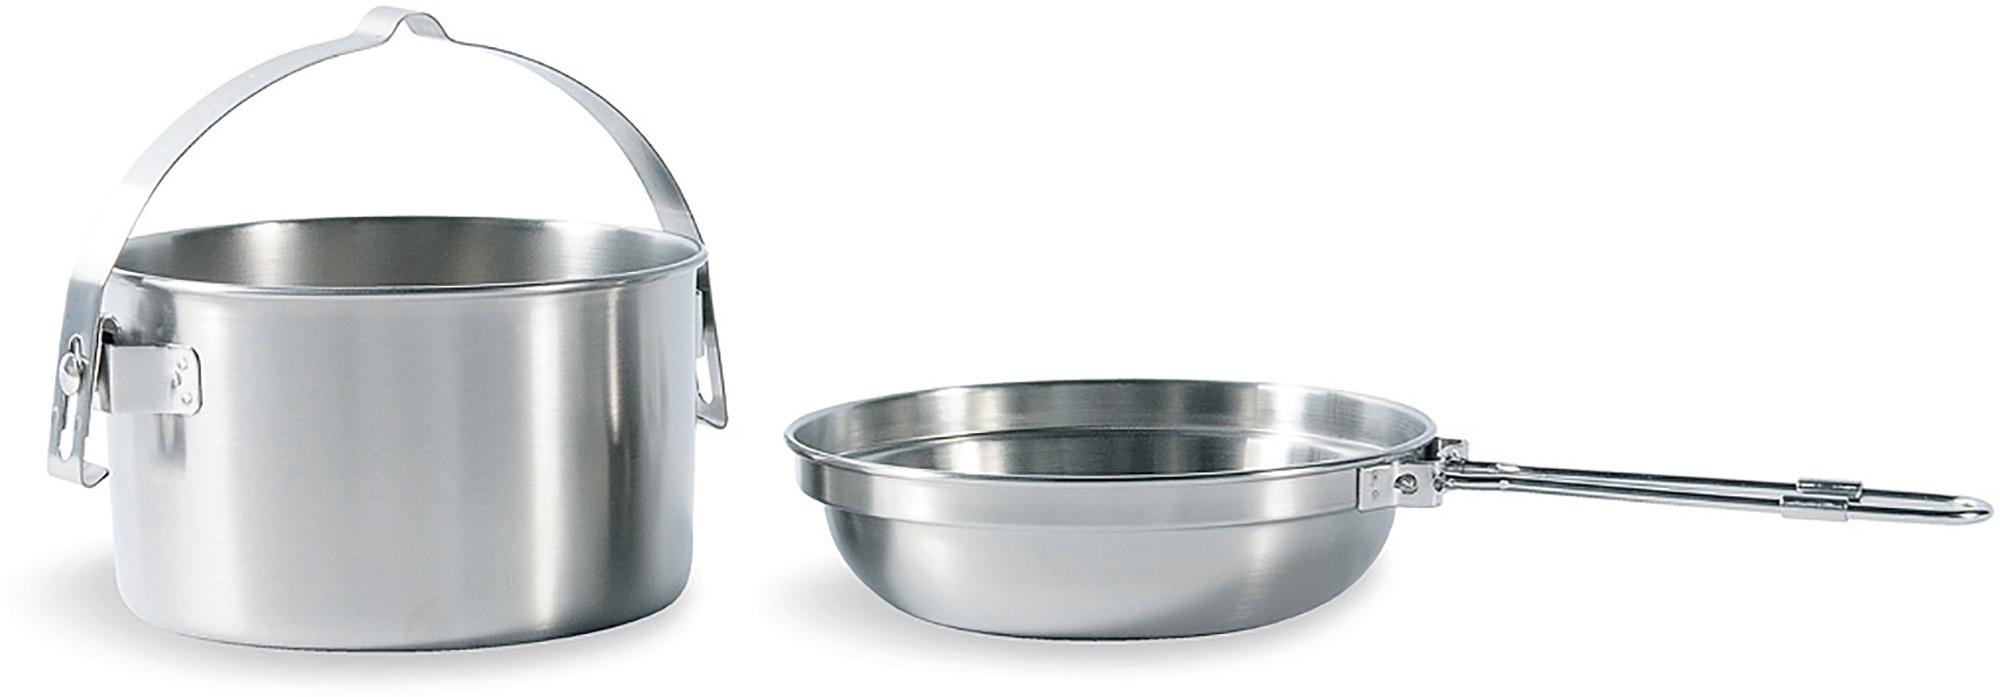 цена на Tatonka Набор посуды: котелок, сковорода-миска Tatonka KETTLE 1.0 L